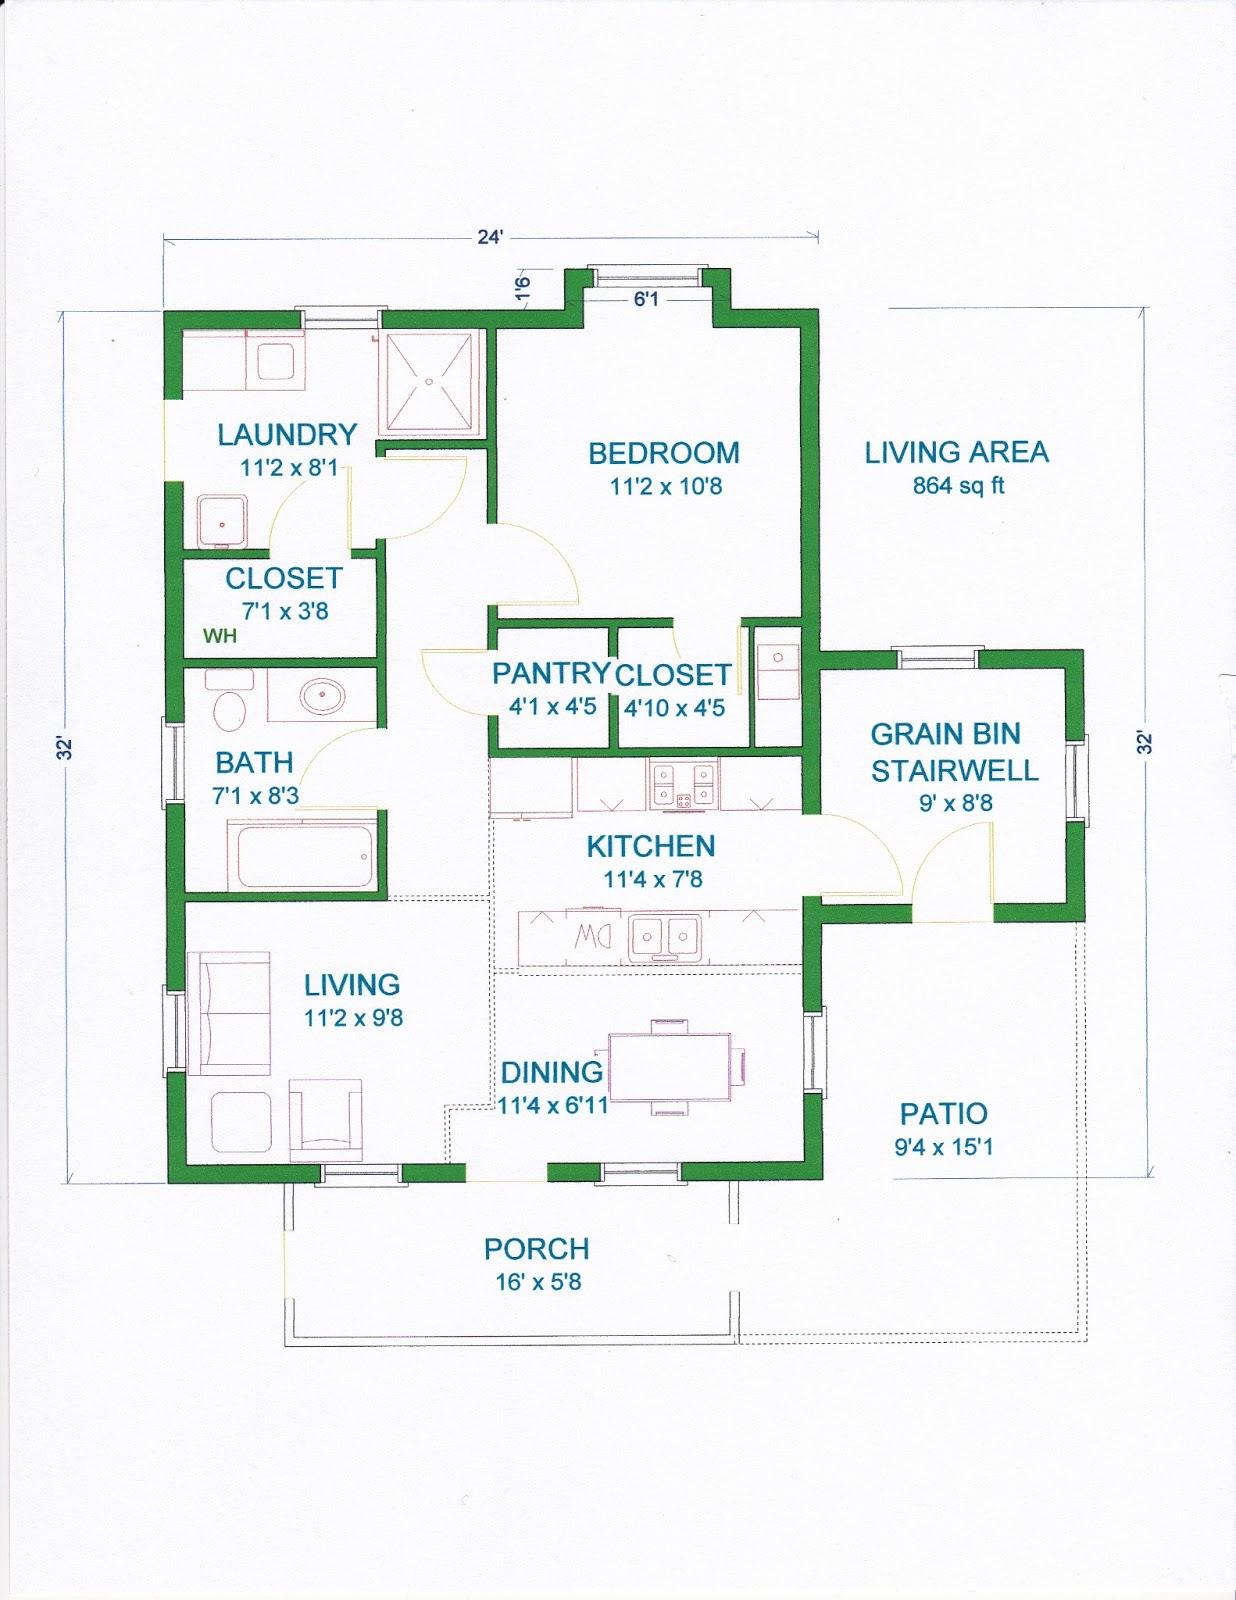 Grama sue39s floor plan play land gambrel barn home 24 x32 for Bedroom floor plans 24 x 32